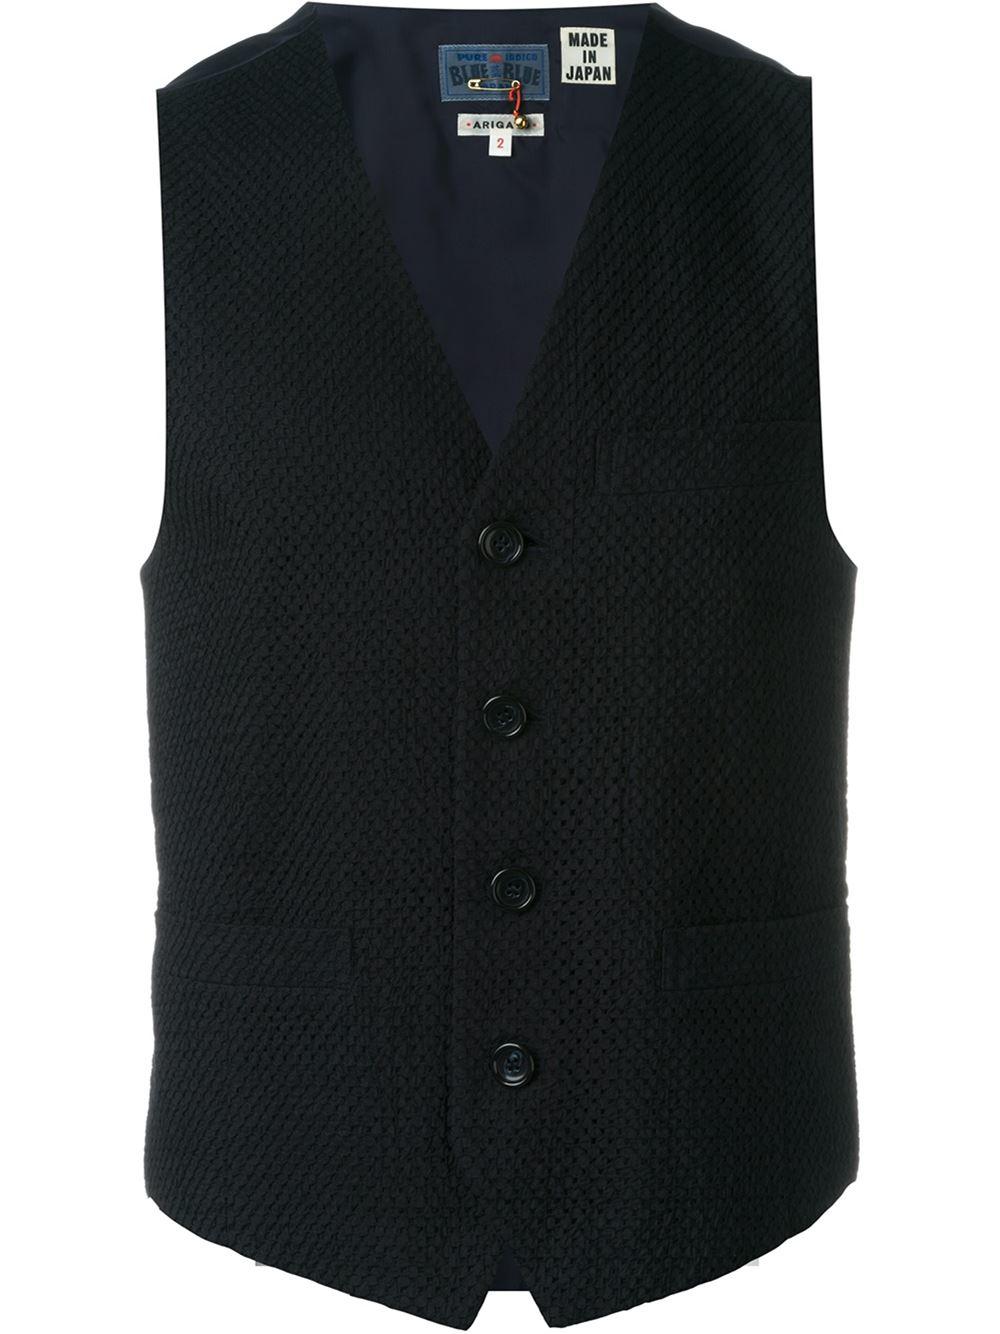 Blue blue japan Knitted Waistcoat in Black for Men